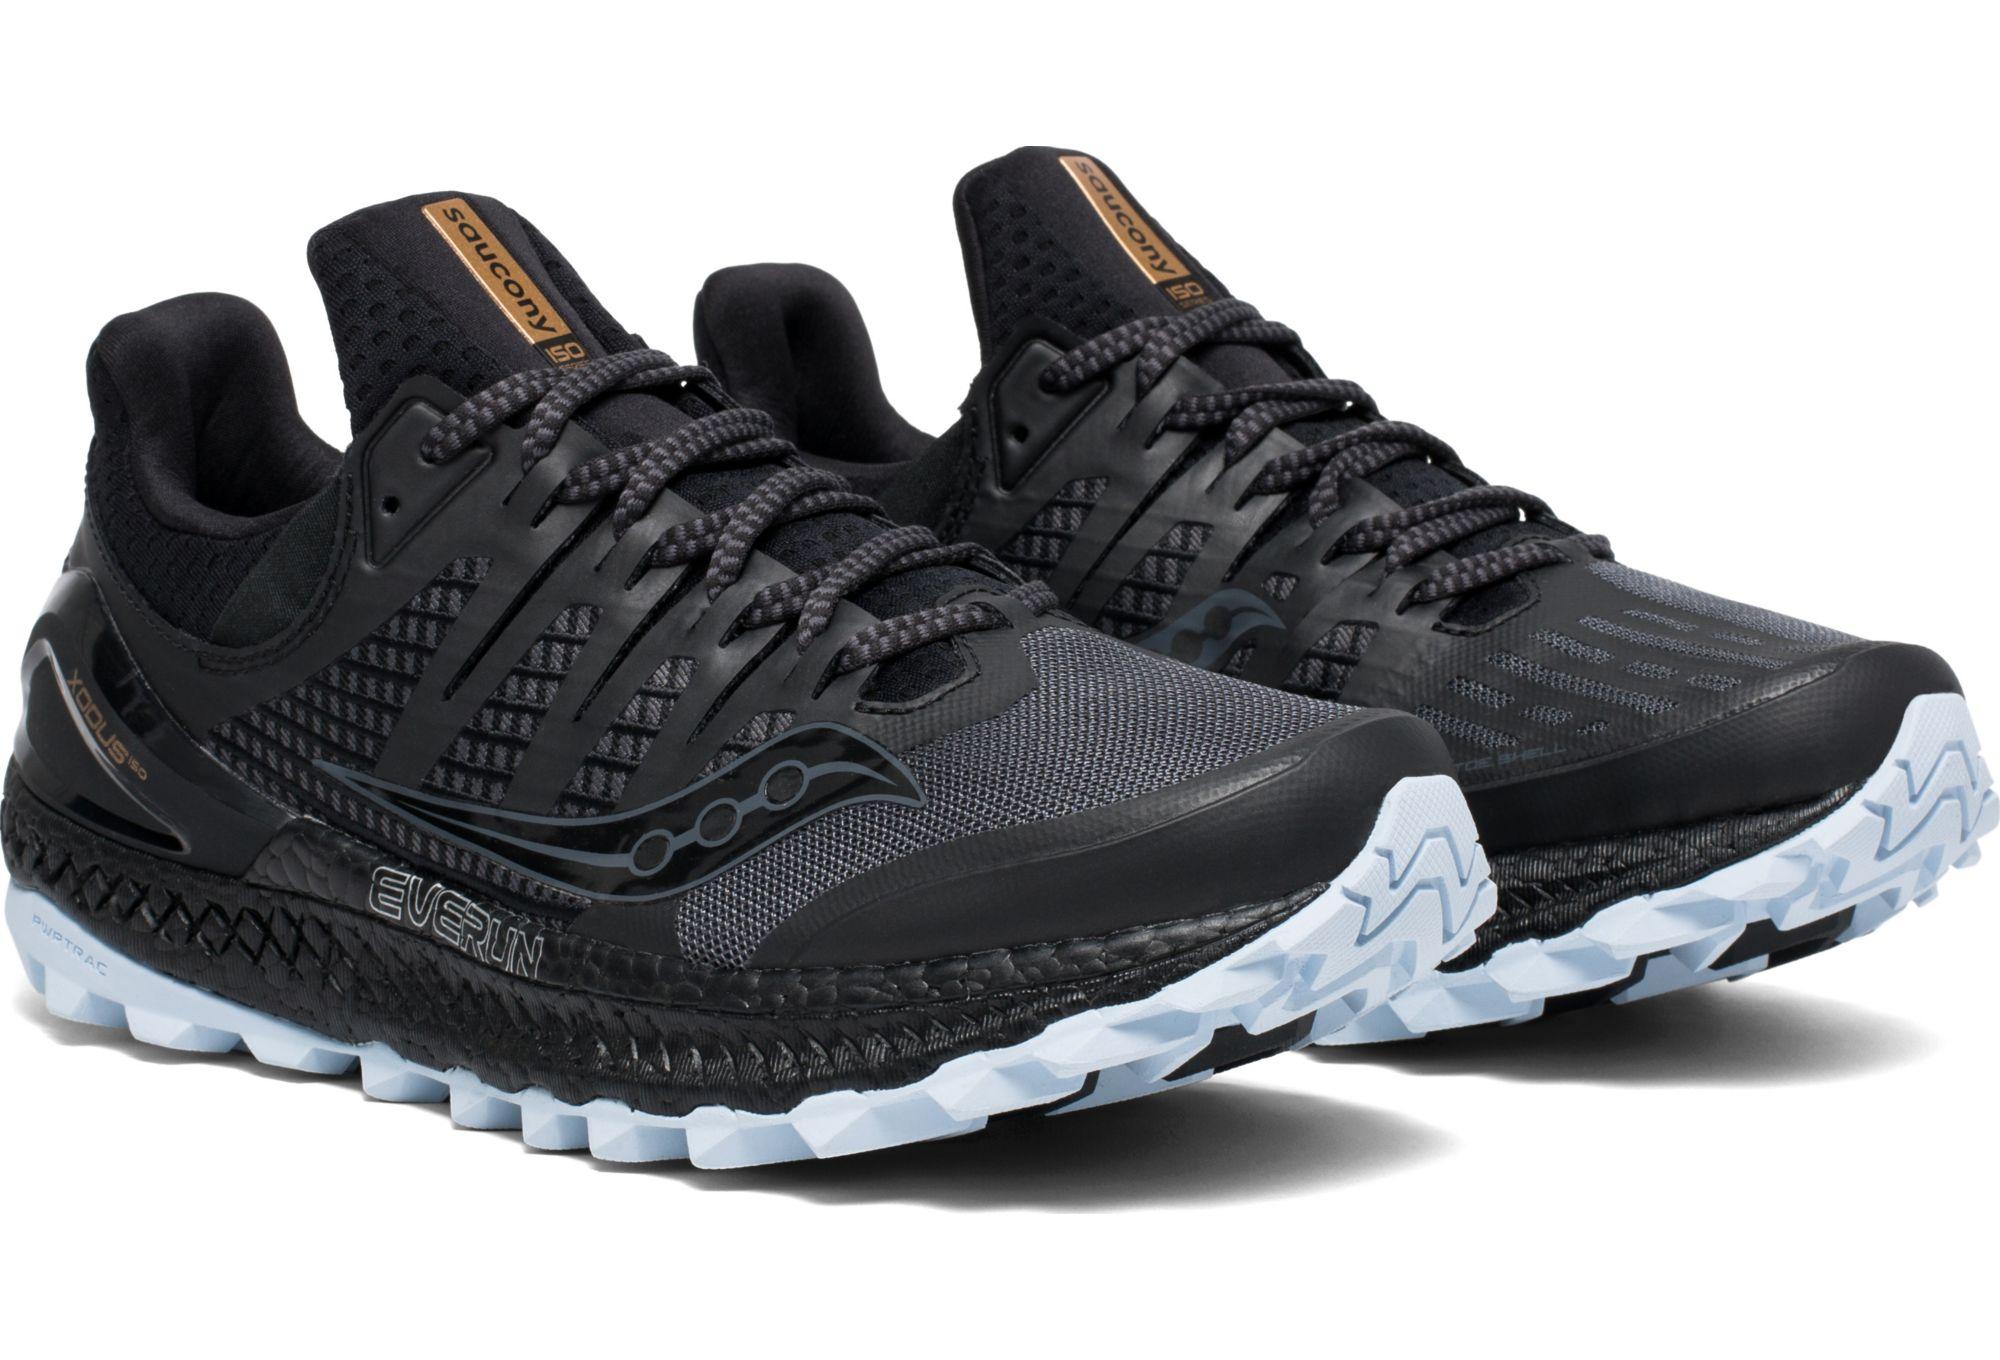 ae191ae2 Chaussures de Running Femme Saucony Xodus ISO 3 Gris Noir